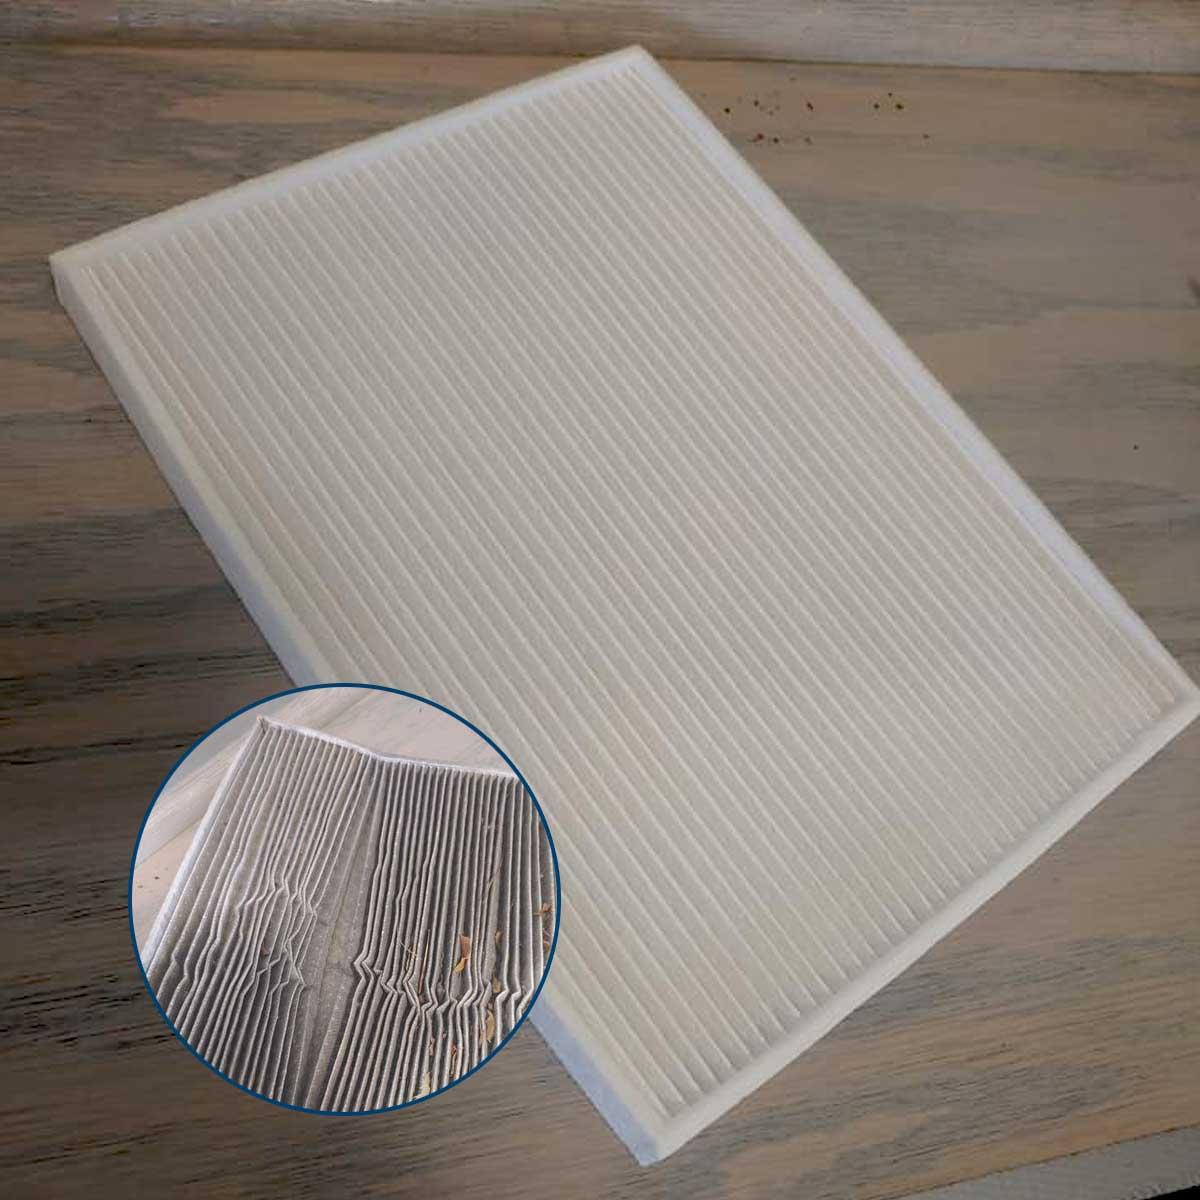 Show a damaged cabin air filter